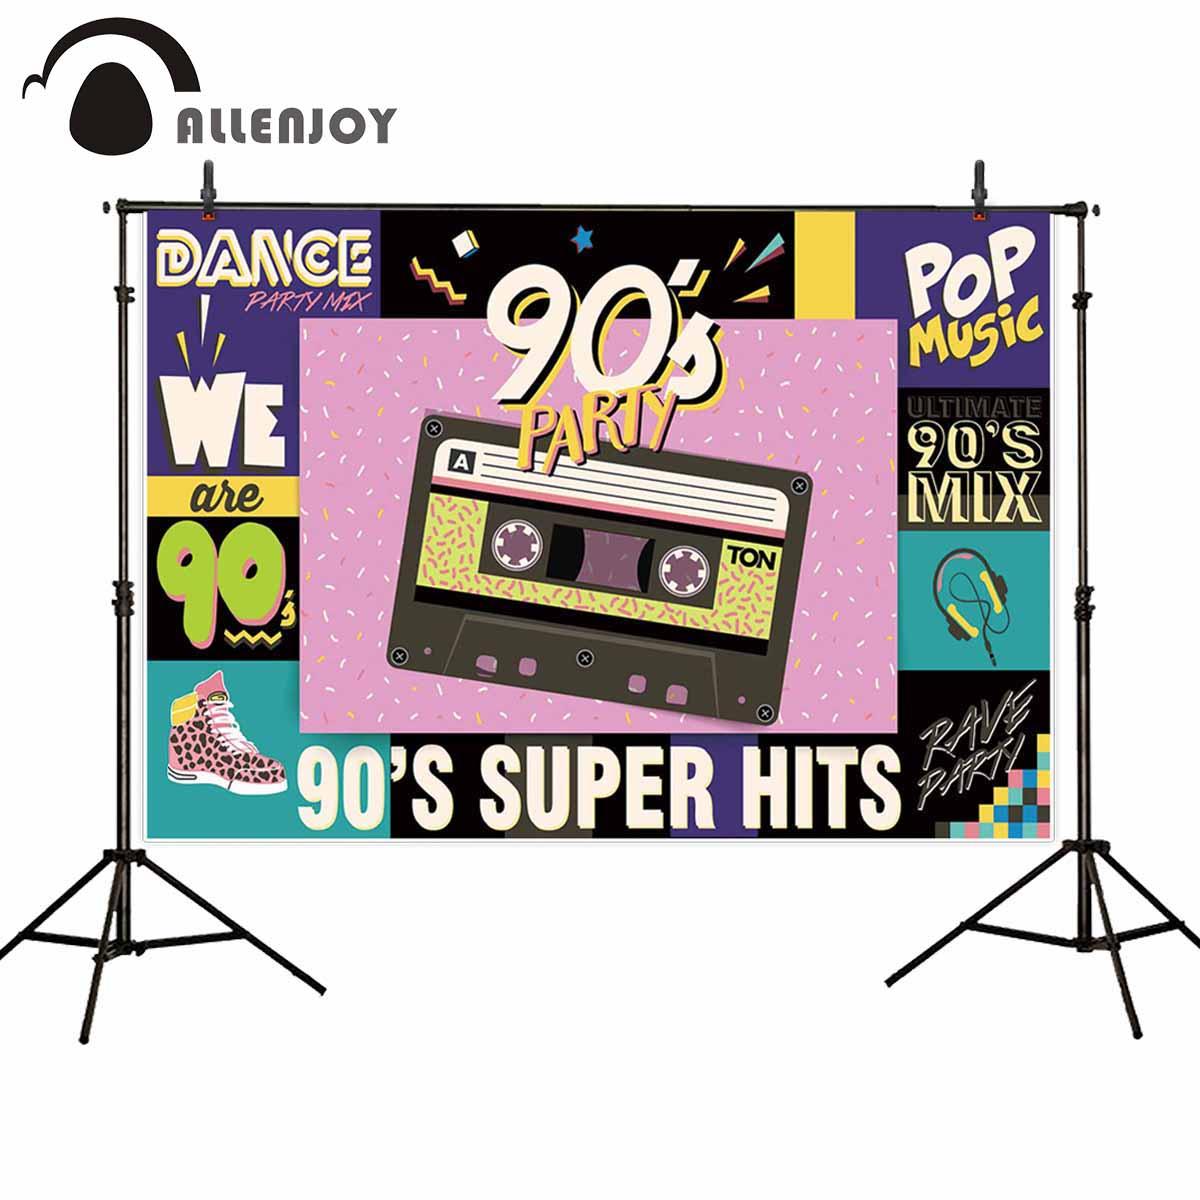 Allenjoy fotográfico Fondo 90s vintage hip hop pop rock música baile Fondo foto disparar photocall photobooth prop de